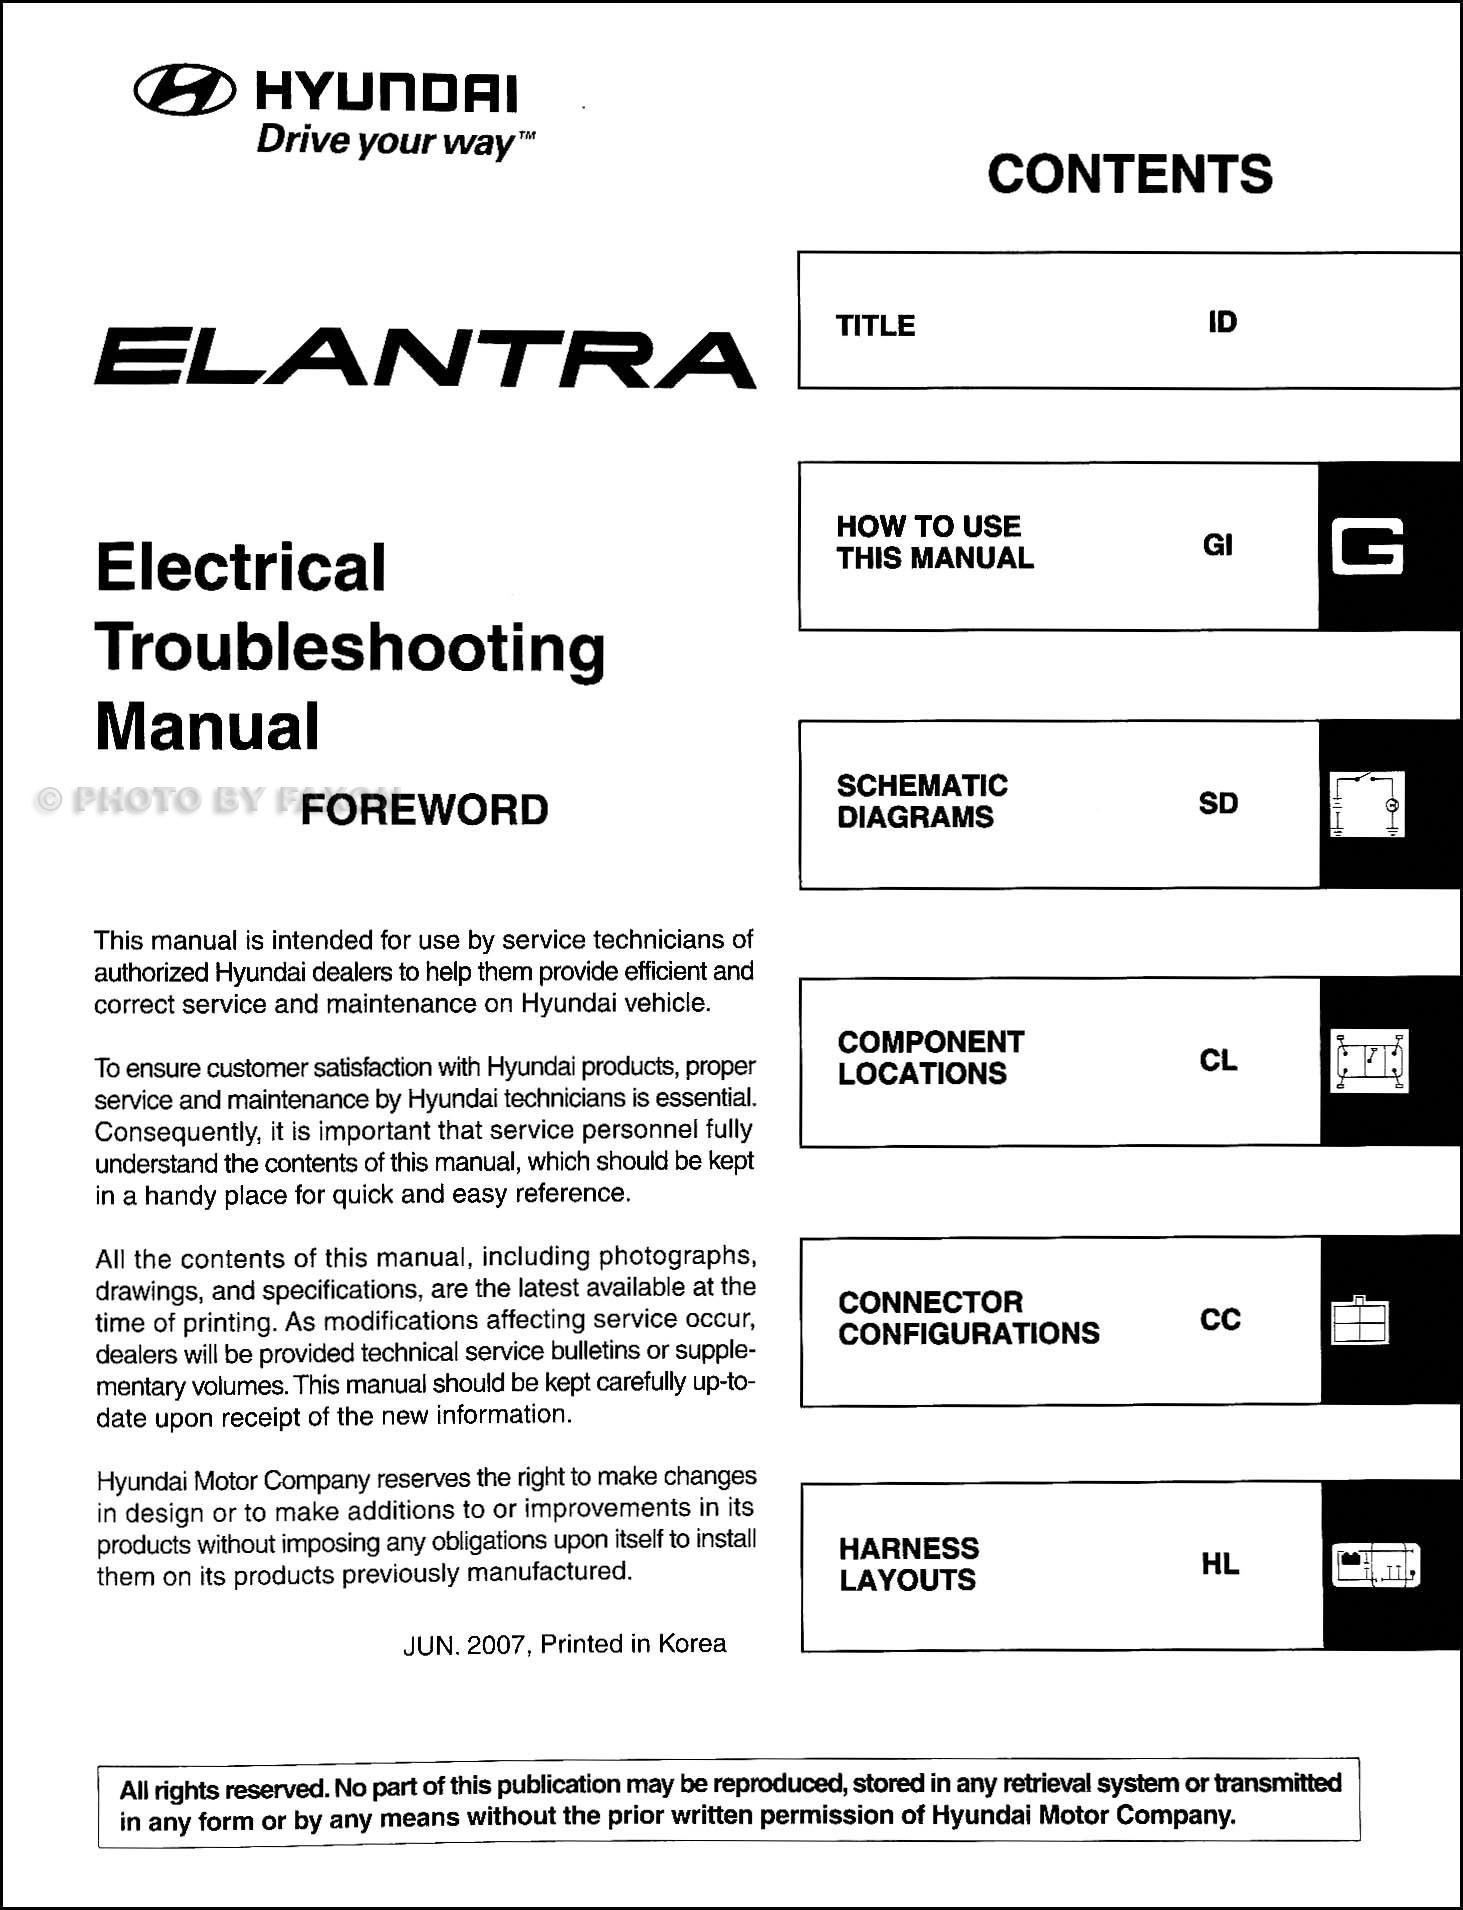 Wiring Diagram Hyundai Elantra 2008 - Database wiring diagramcervicalefano.it